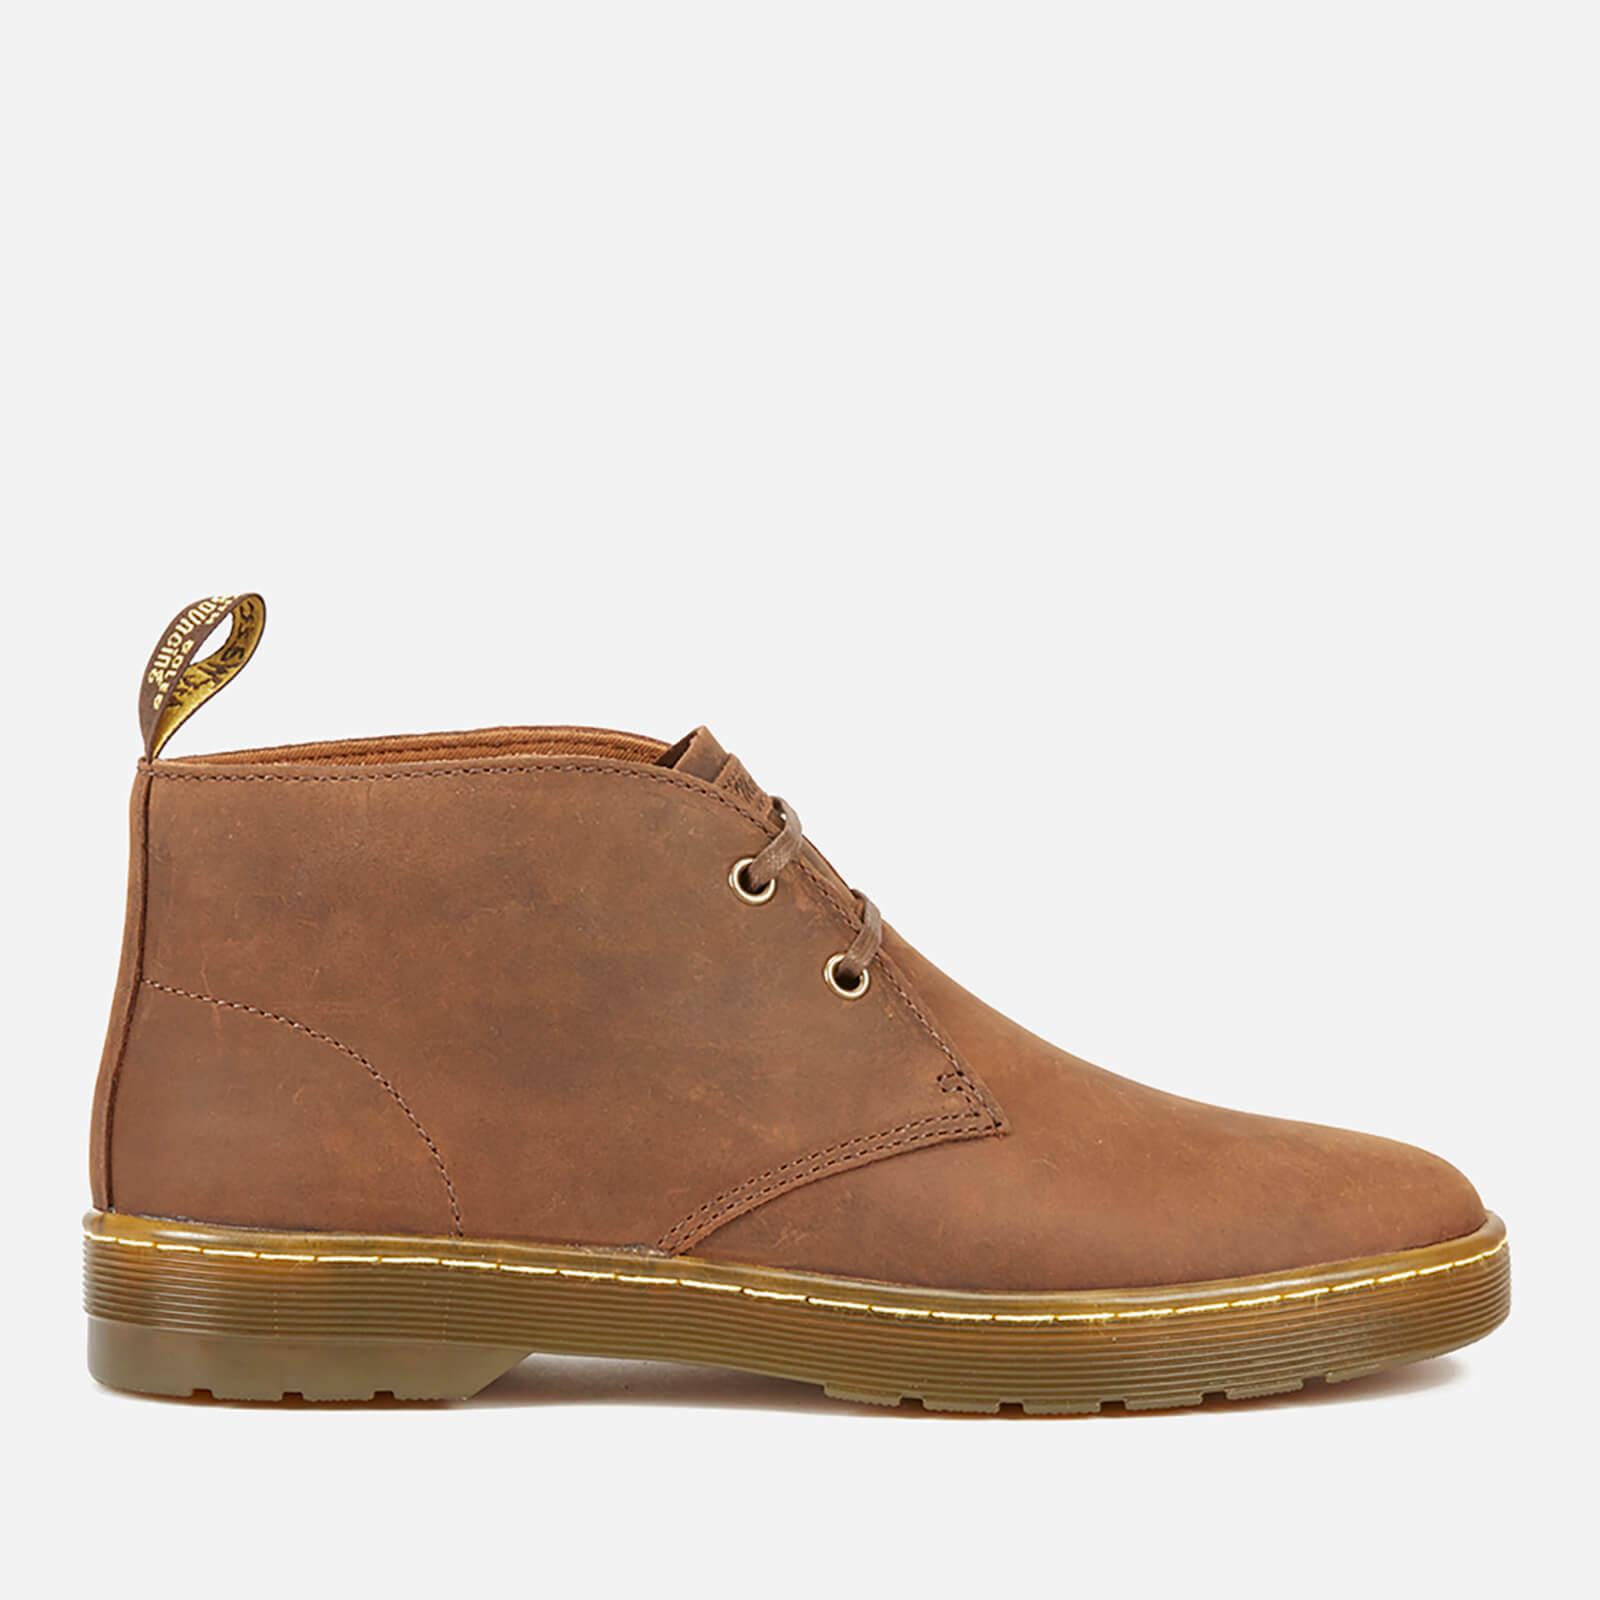 Dr. Martens Men's Cabrillo Crazyhorse Leather Desert Boots - Gaucho - UK 7